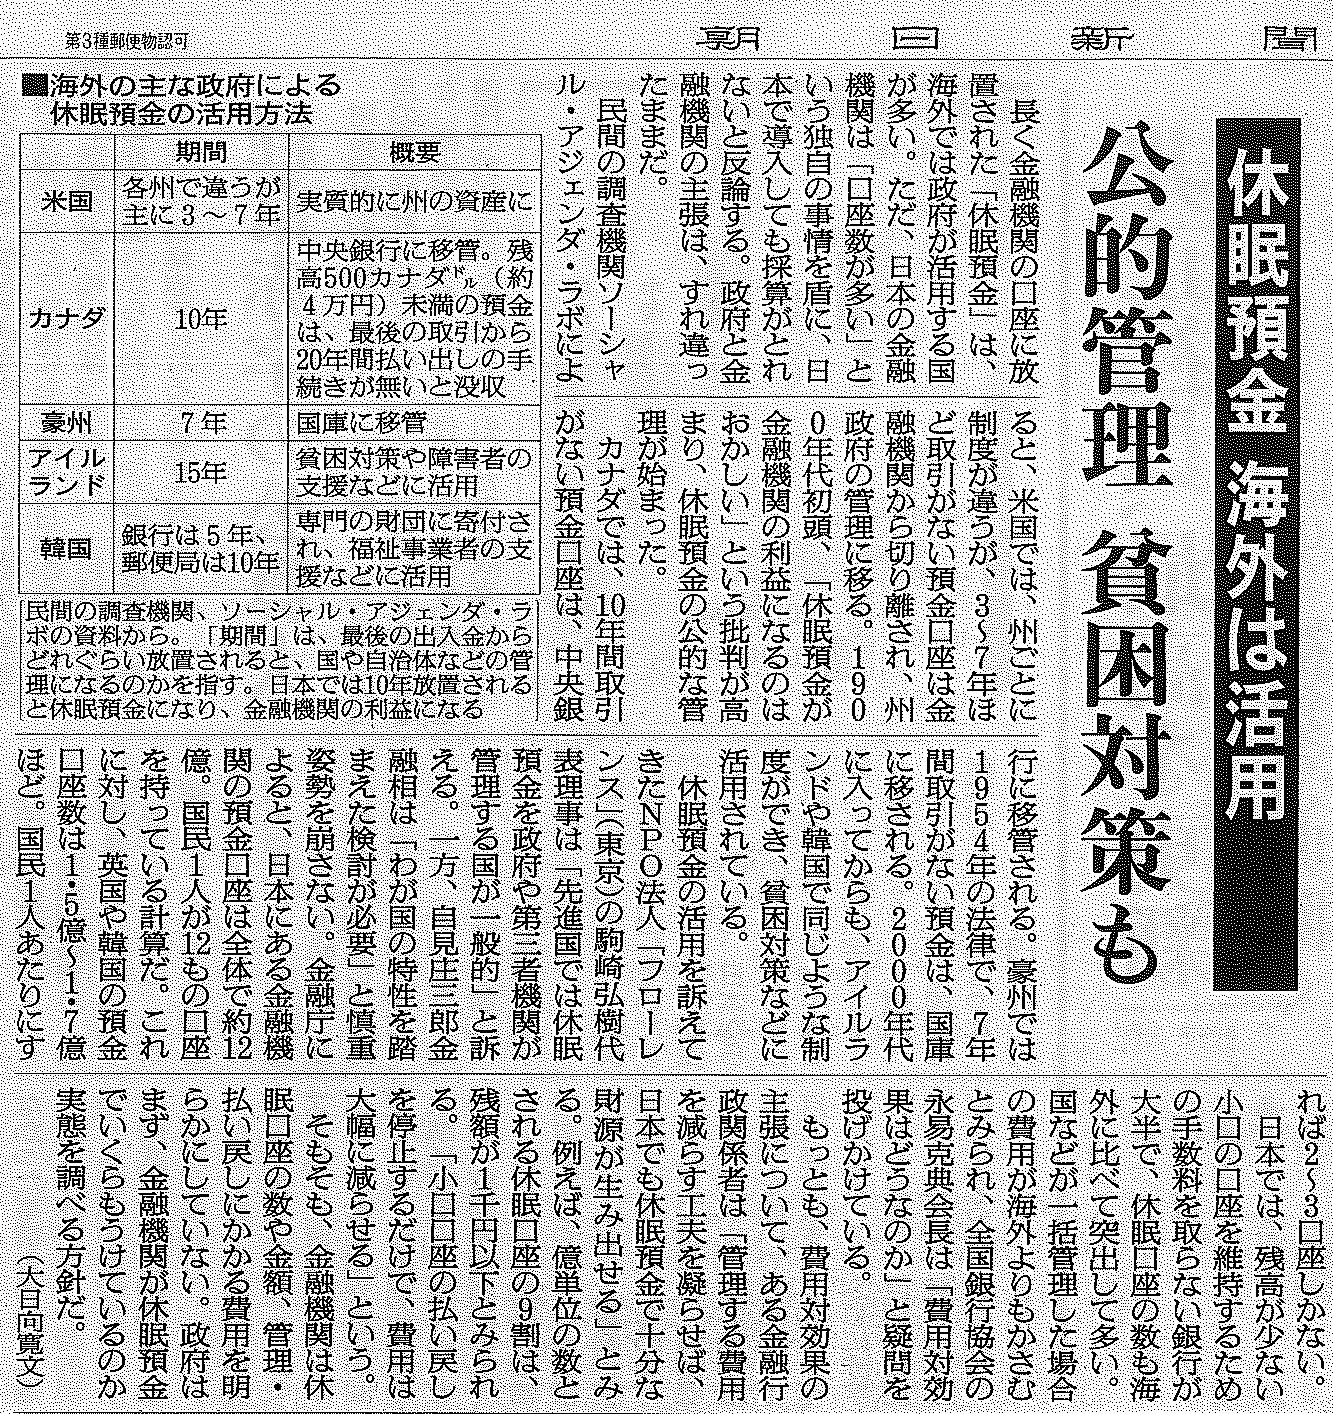 NC_【休眠口座】_朝日新聞_20120221_休眠預金海外は活用.jpg